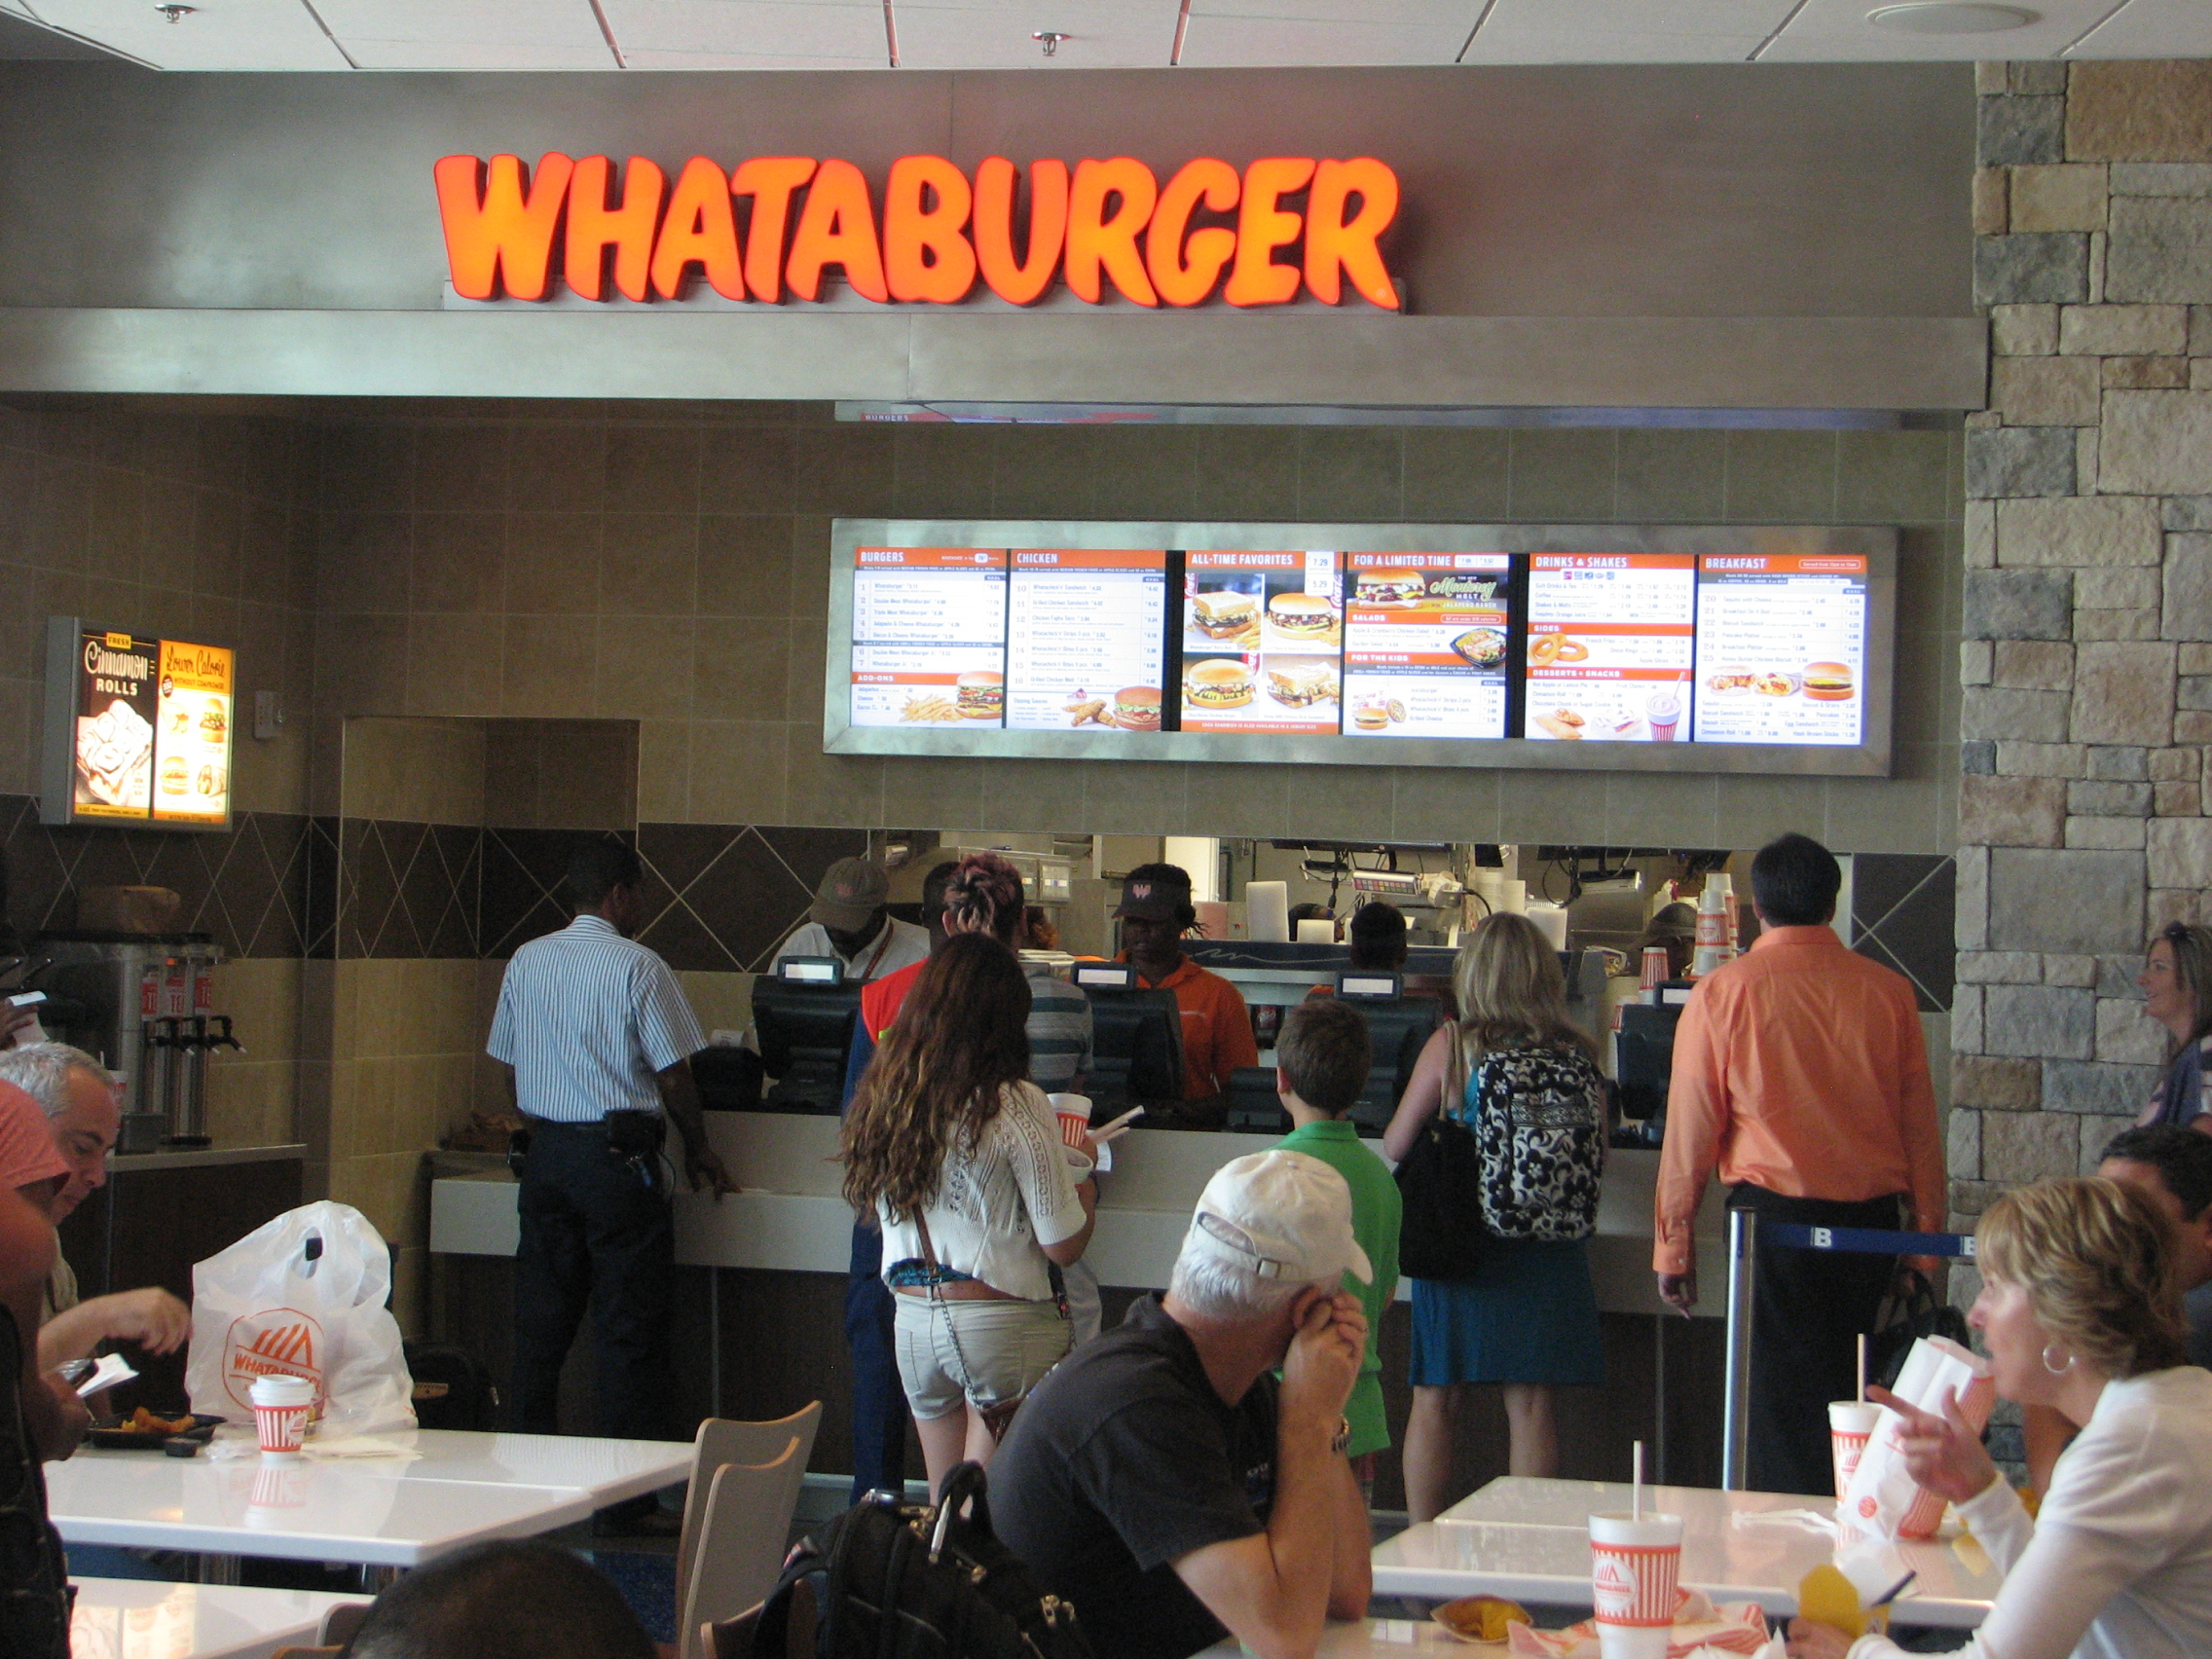 OSM Solutions provides digital menu board system for Whataburger Houston IAH Terminal B South